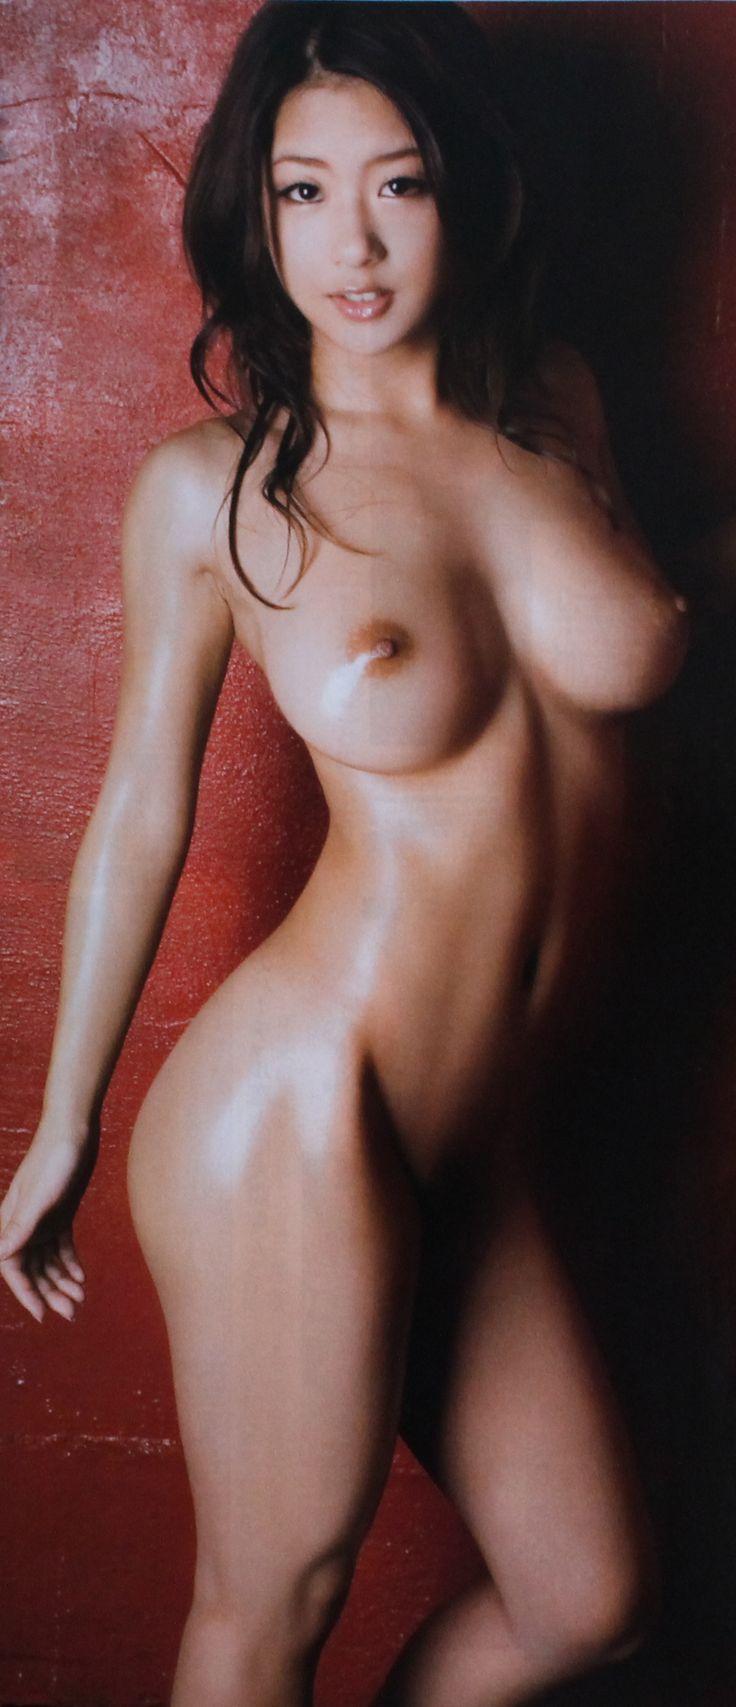 nude-latina-references